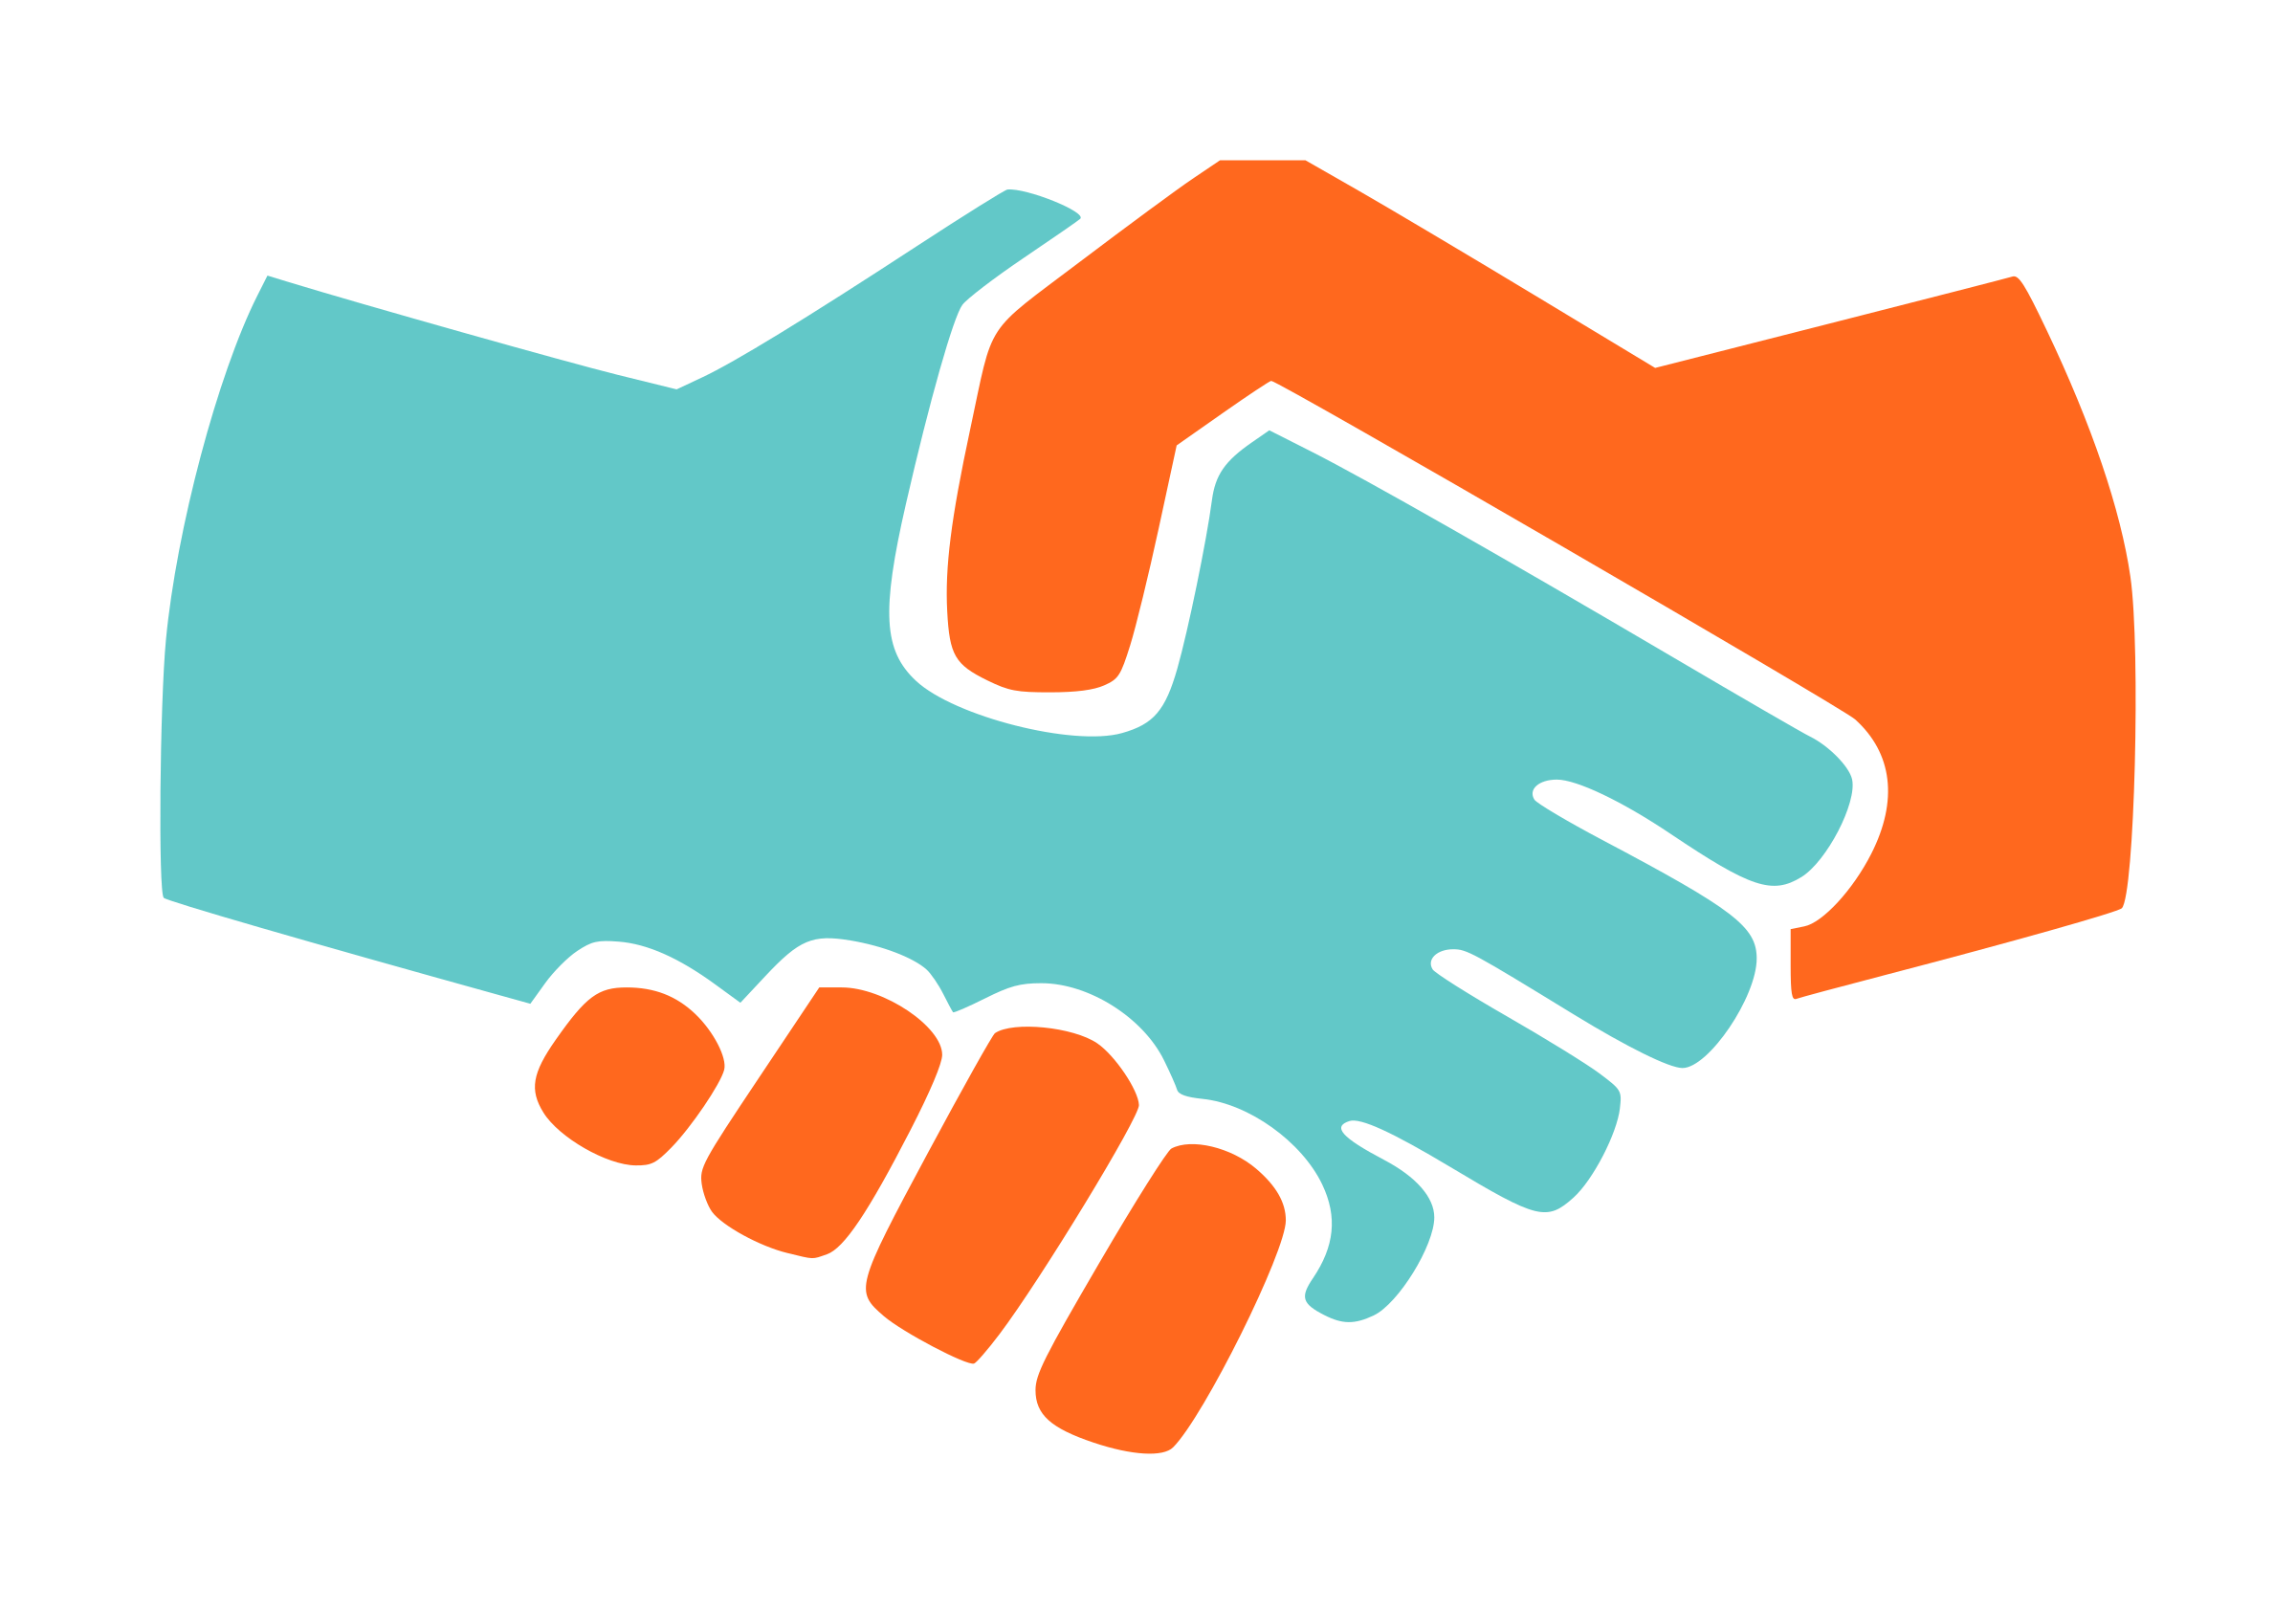 Handshake PNG HD - 129433